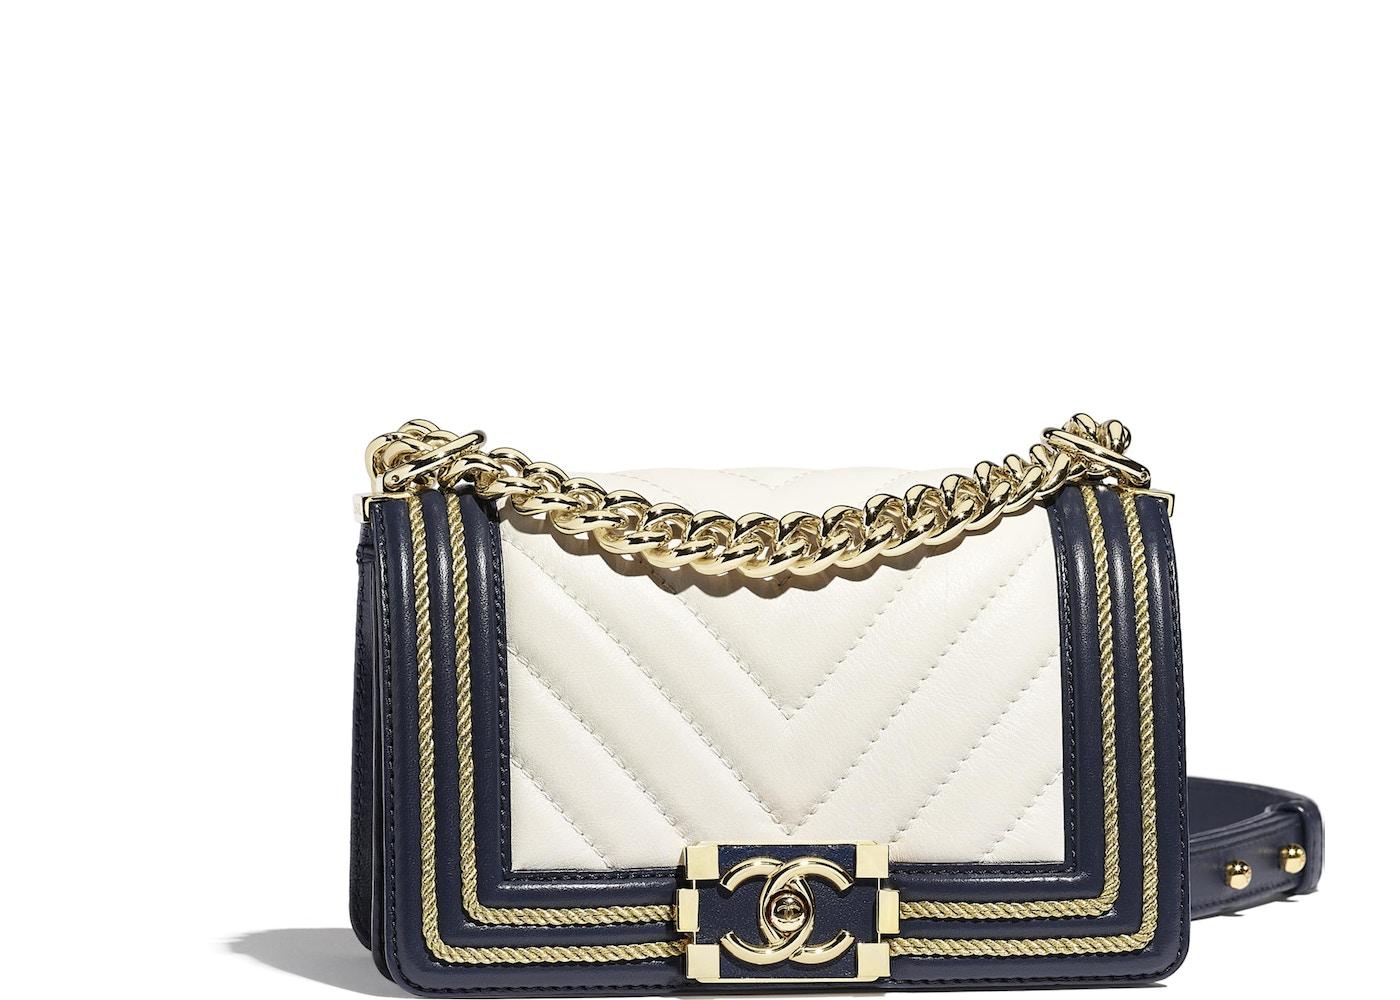 c694be56f17af7 Chanel Boy Handbag Chevron Braid Gold-tone Small White/Navy Blue